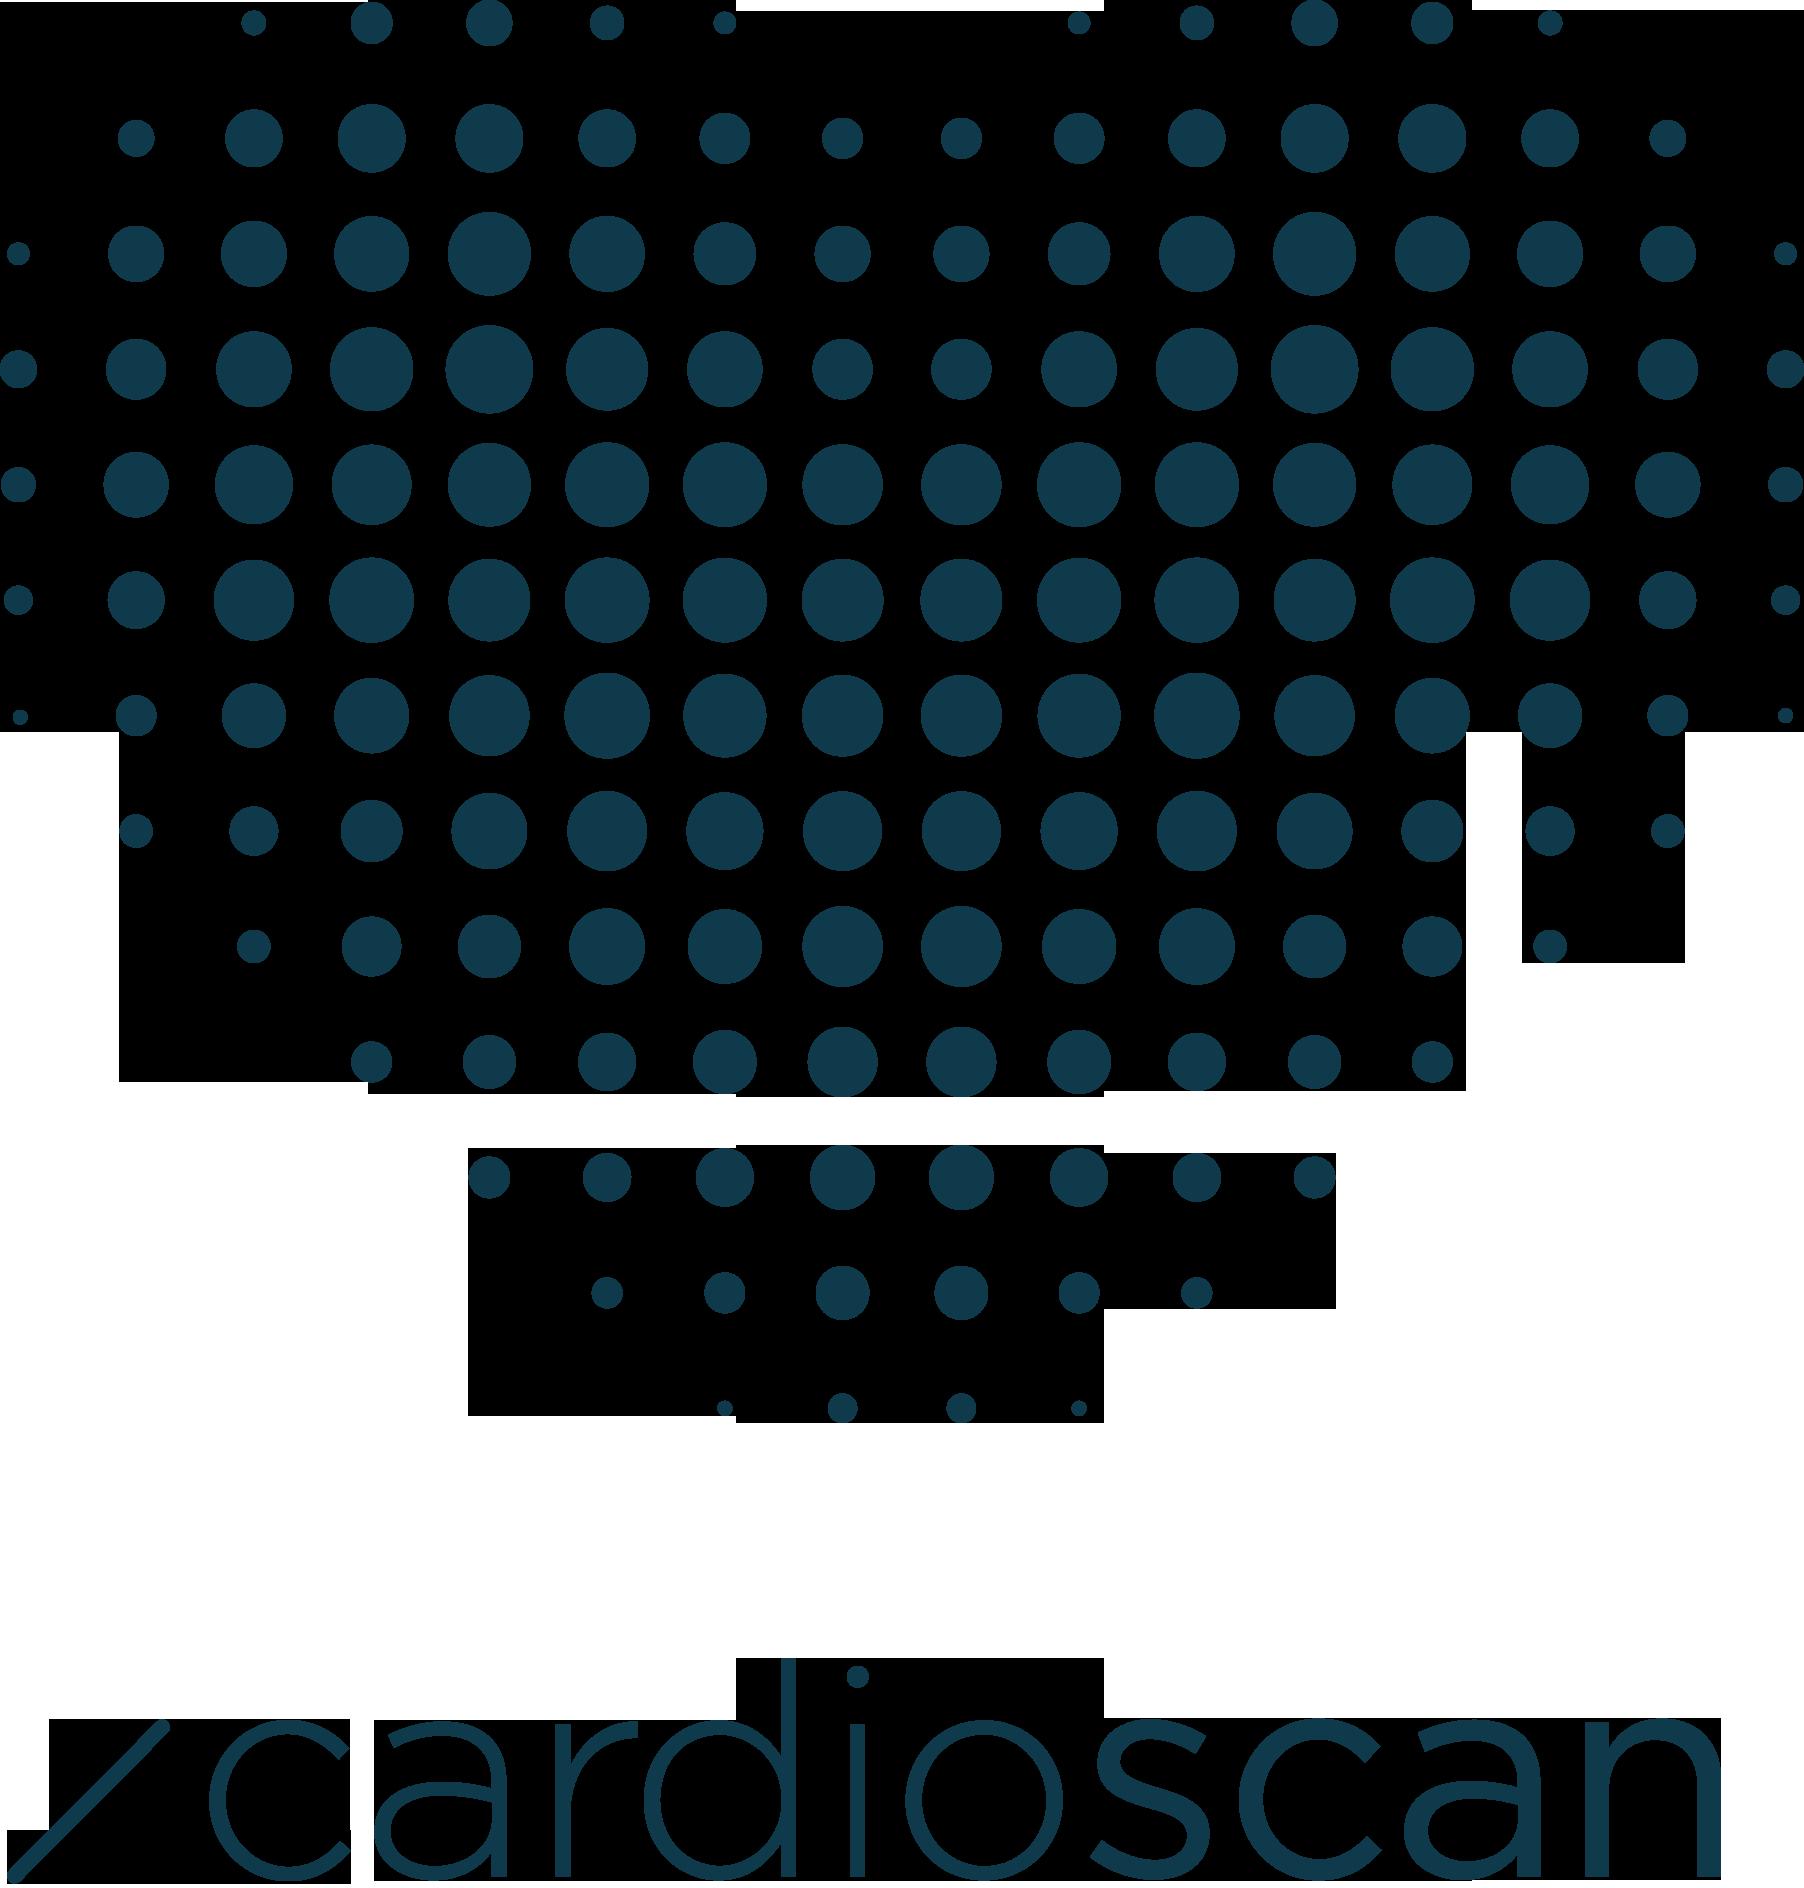 Logo cardioscan